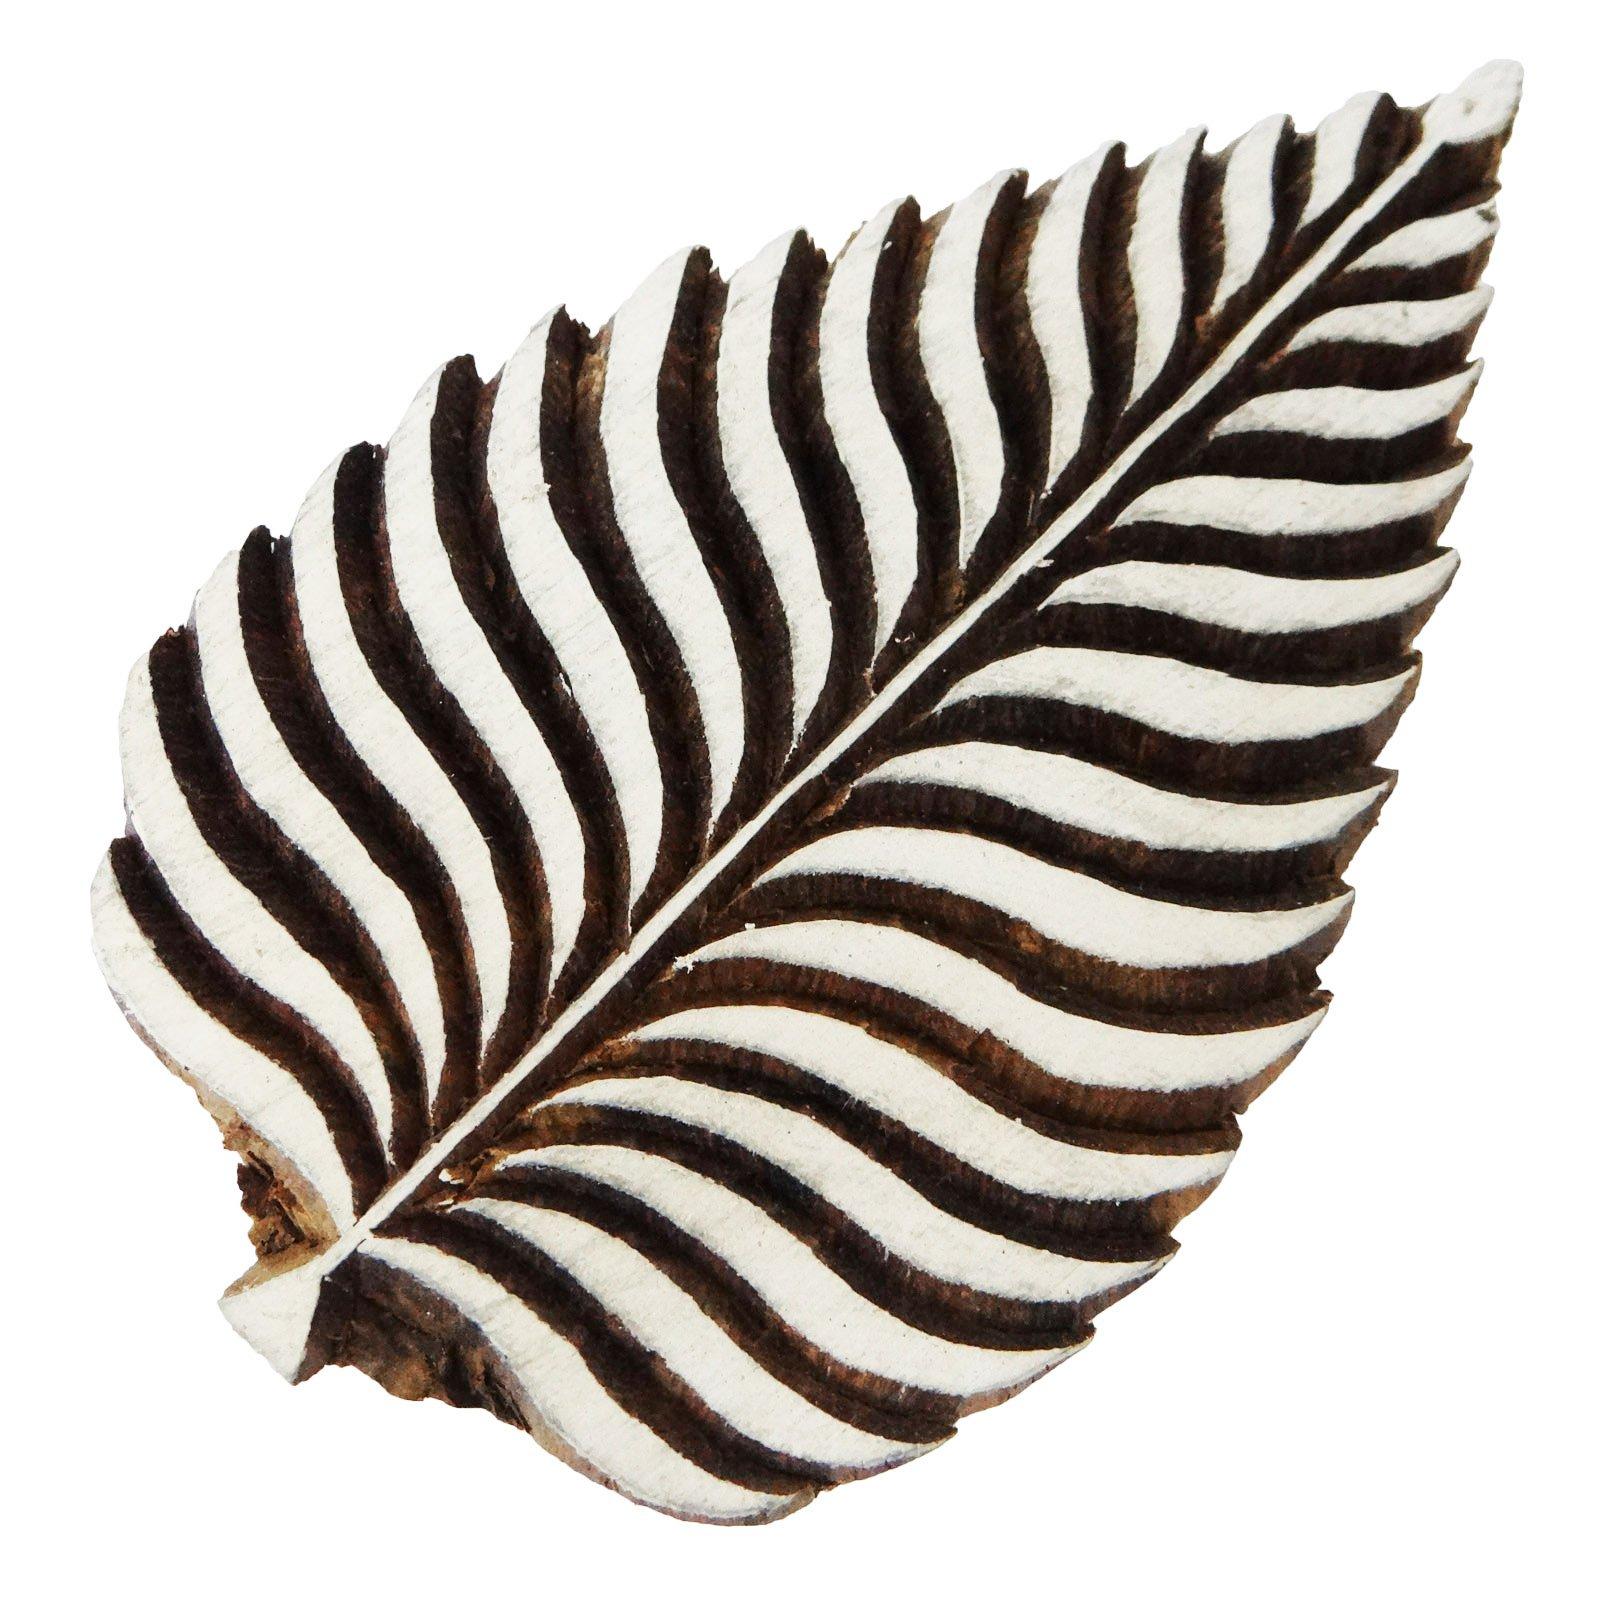 Traditional Leaf Design Wooden Block Decorative Textile Fabric Wood Craft Stamp